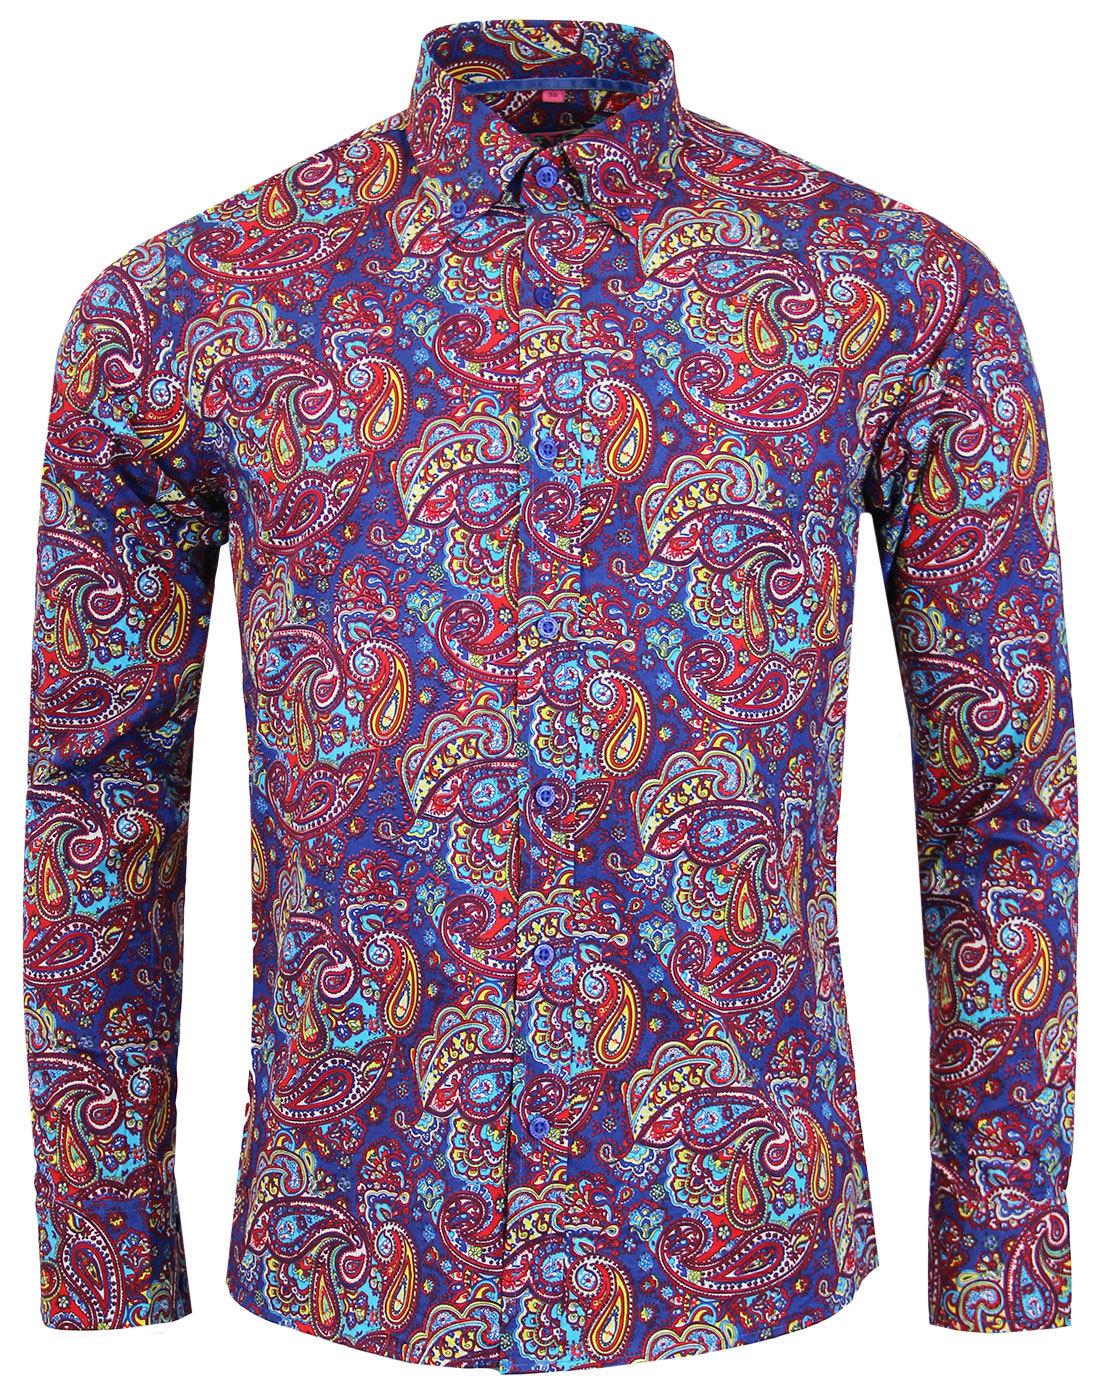 madcap england tabla paisley 1960s mod shirt royal